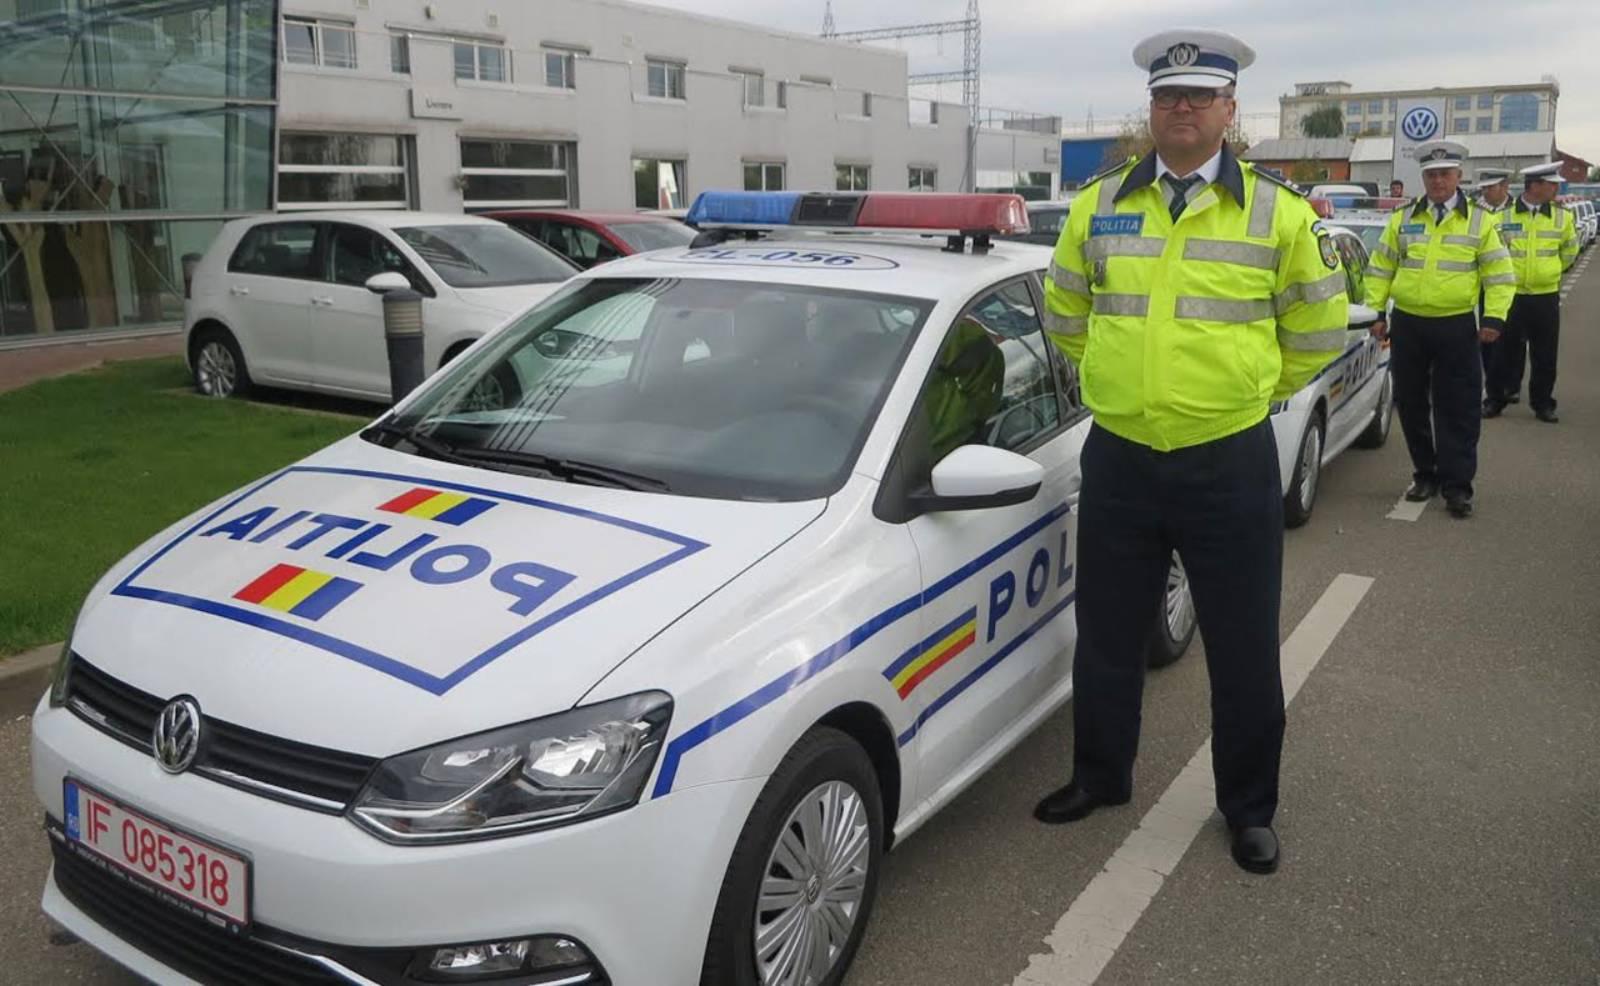 Politia Romana Cumpara Software de Recunoastere Faciala in Public